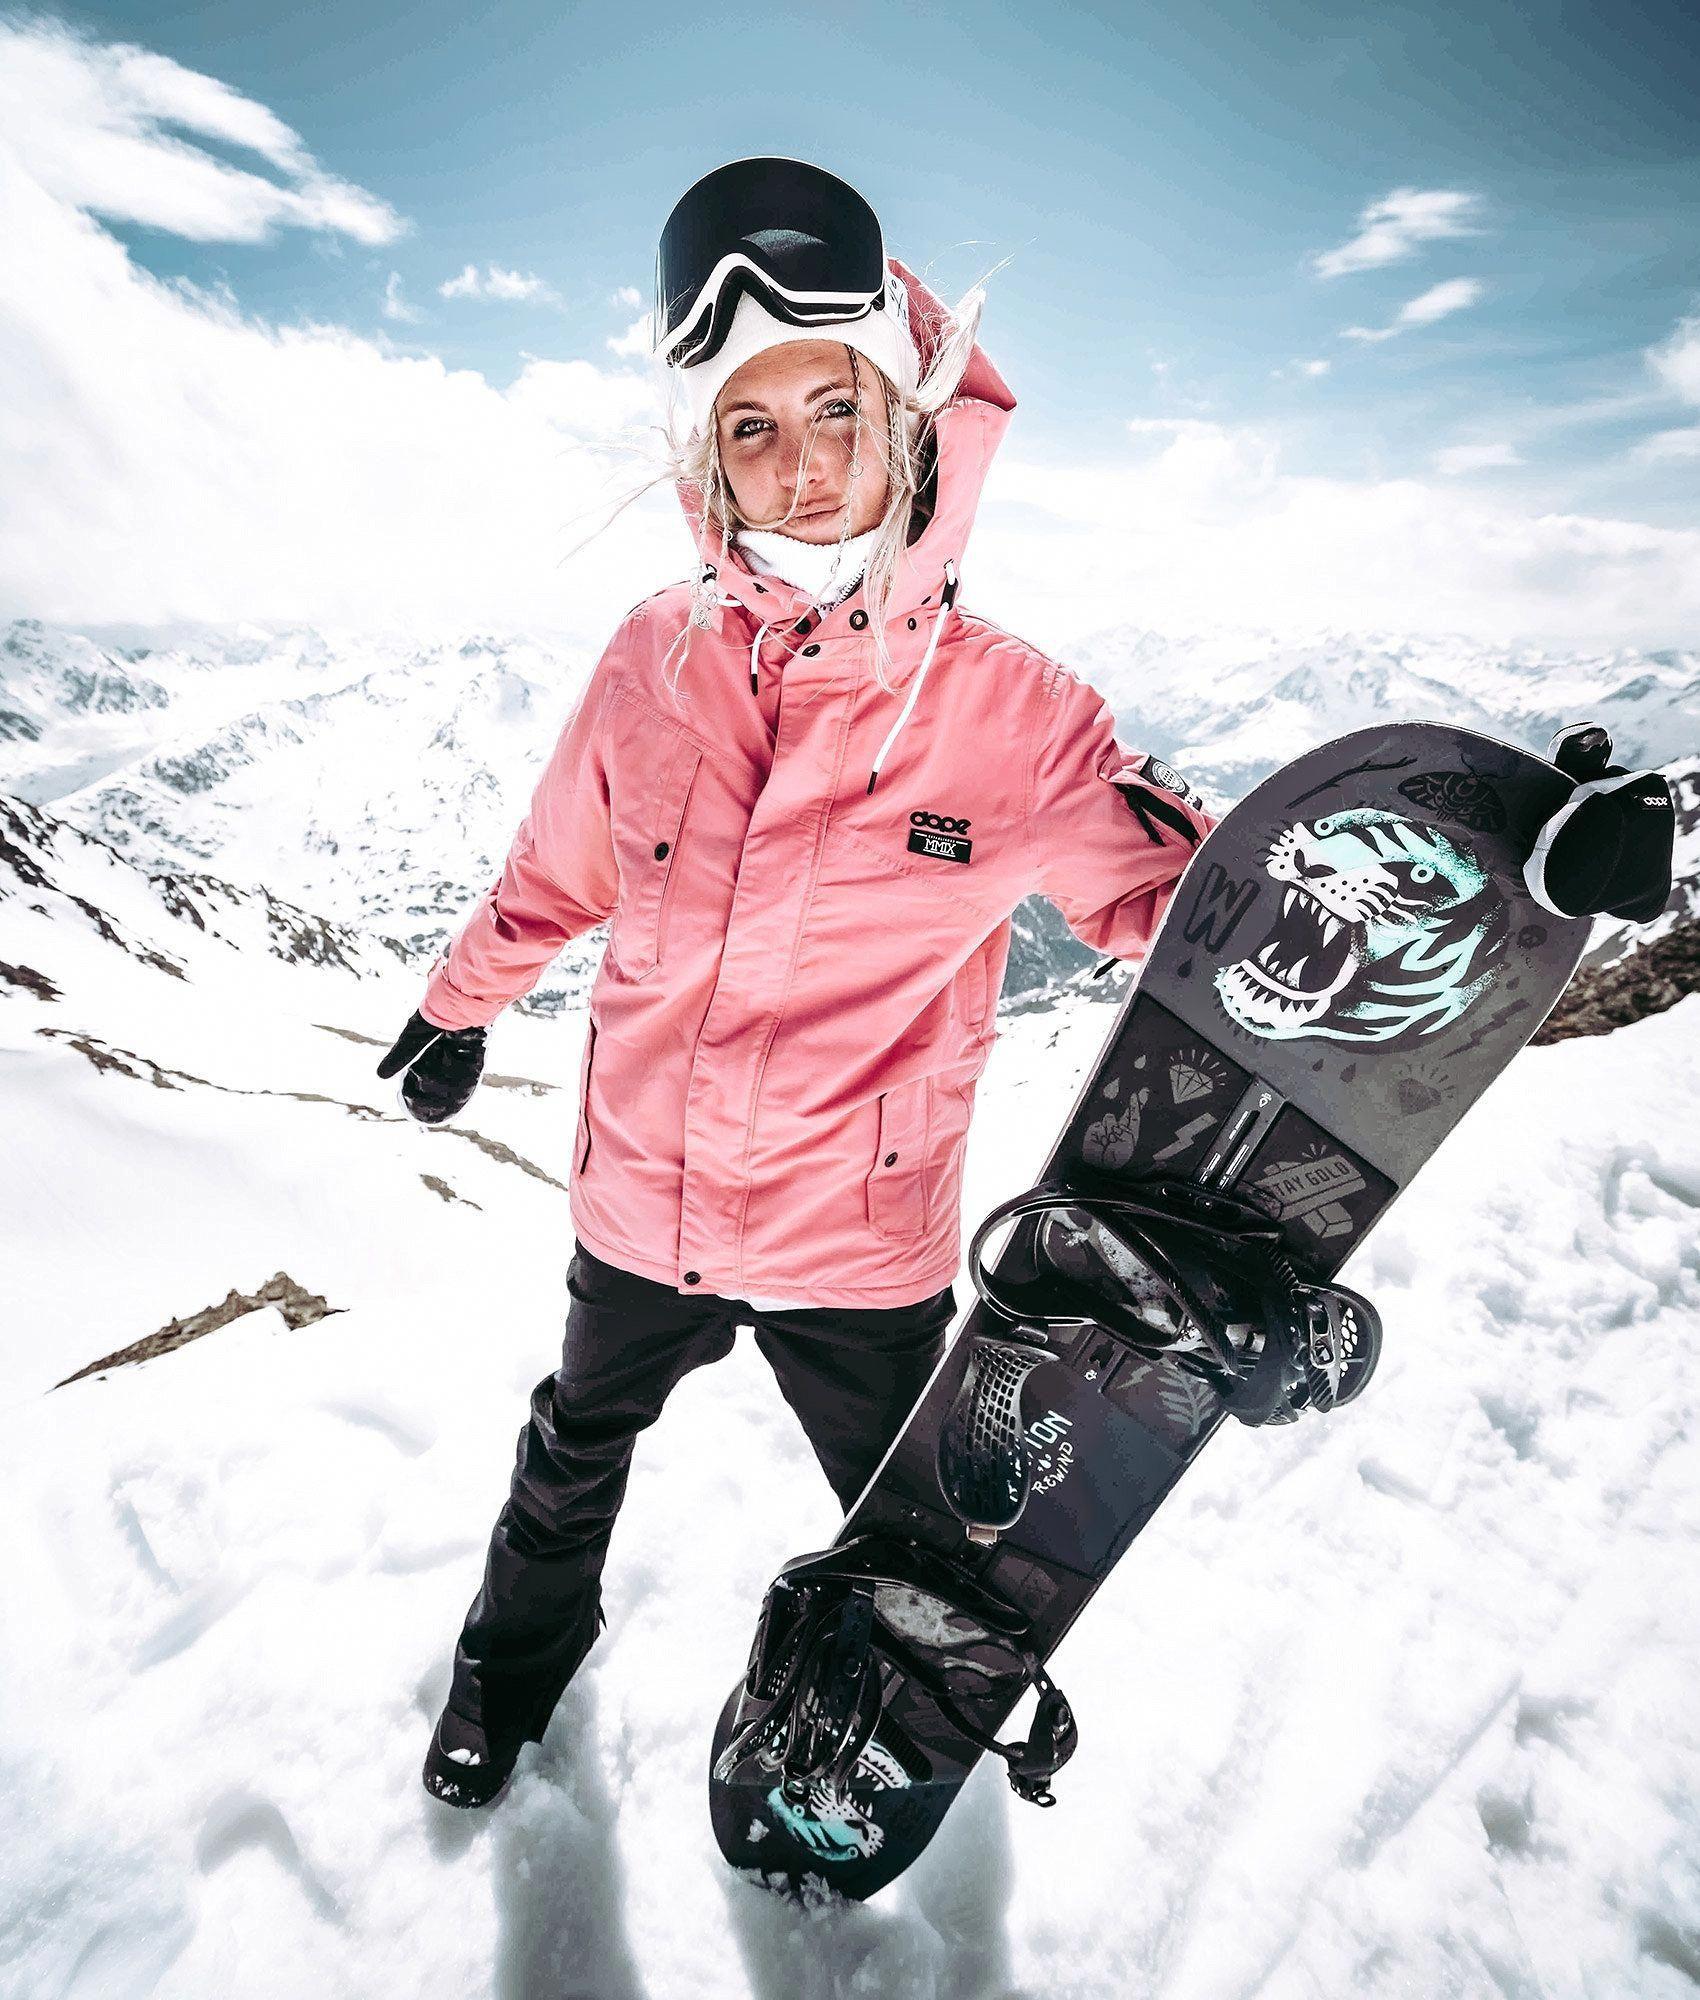 32222236917 snowboarding gear womens snowboard outfit #Snow!!! Outfit Idéer,  Vinterkläder, Snö